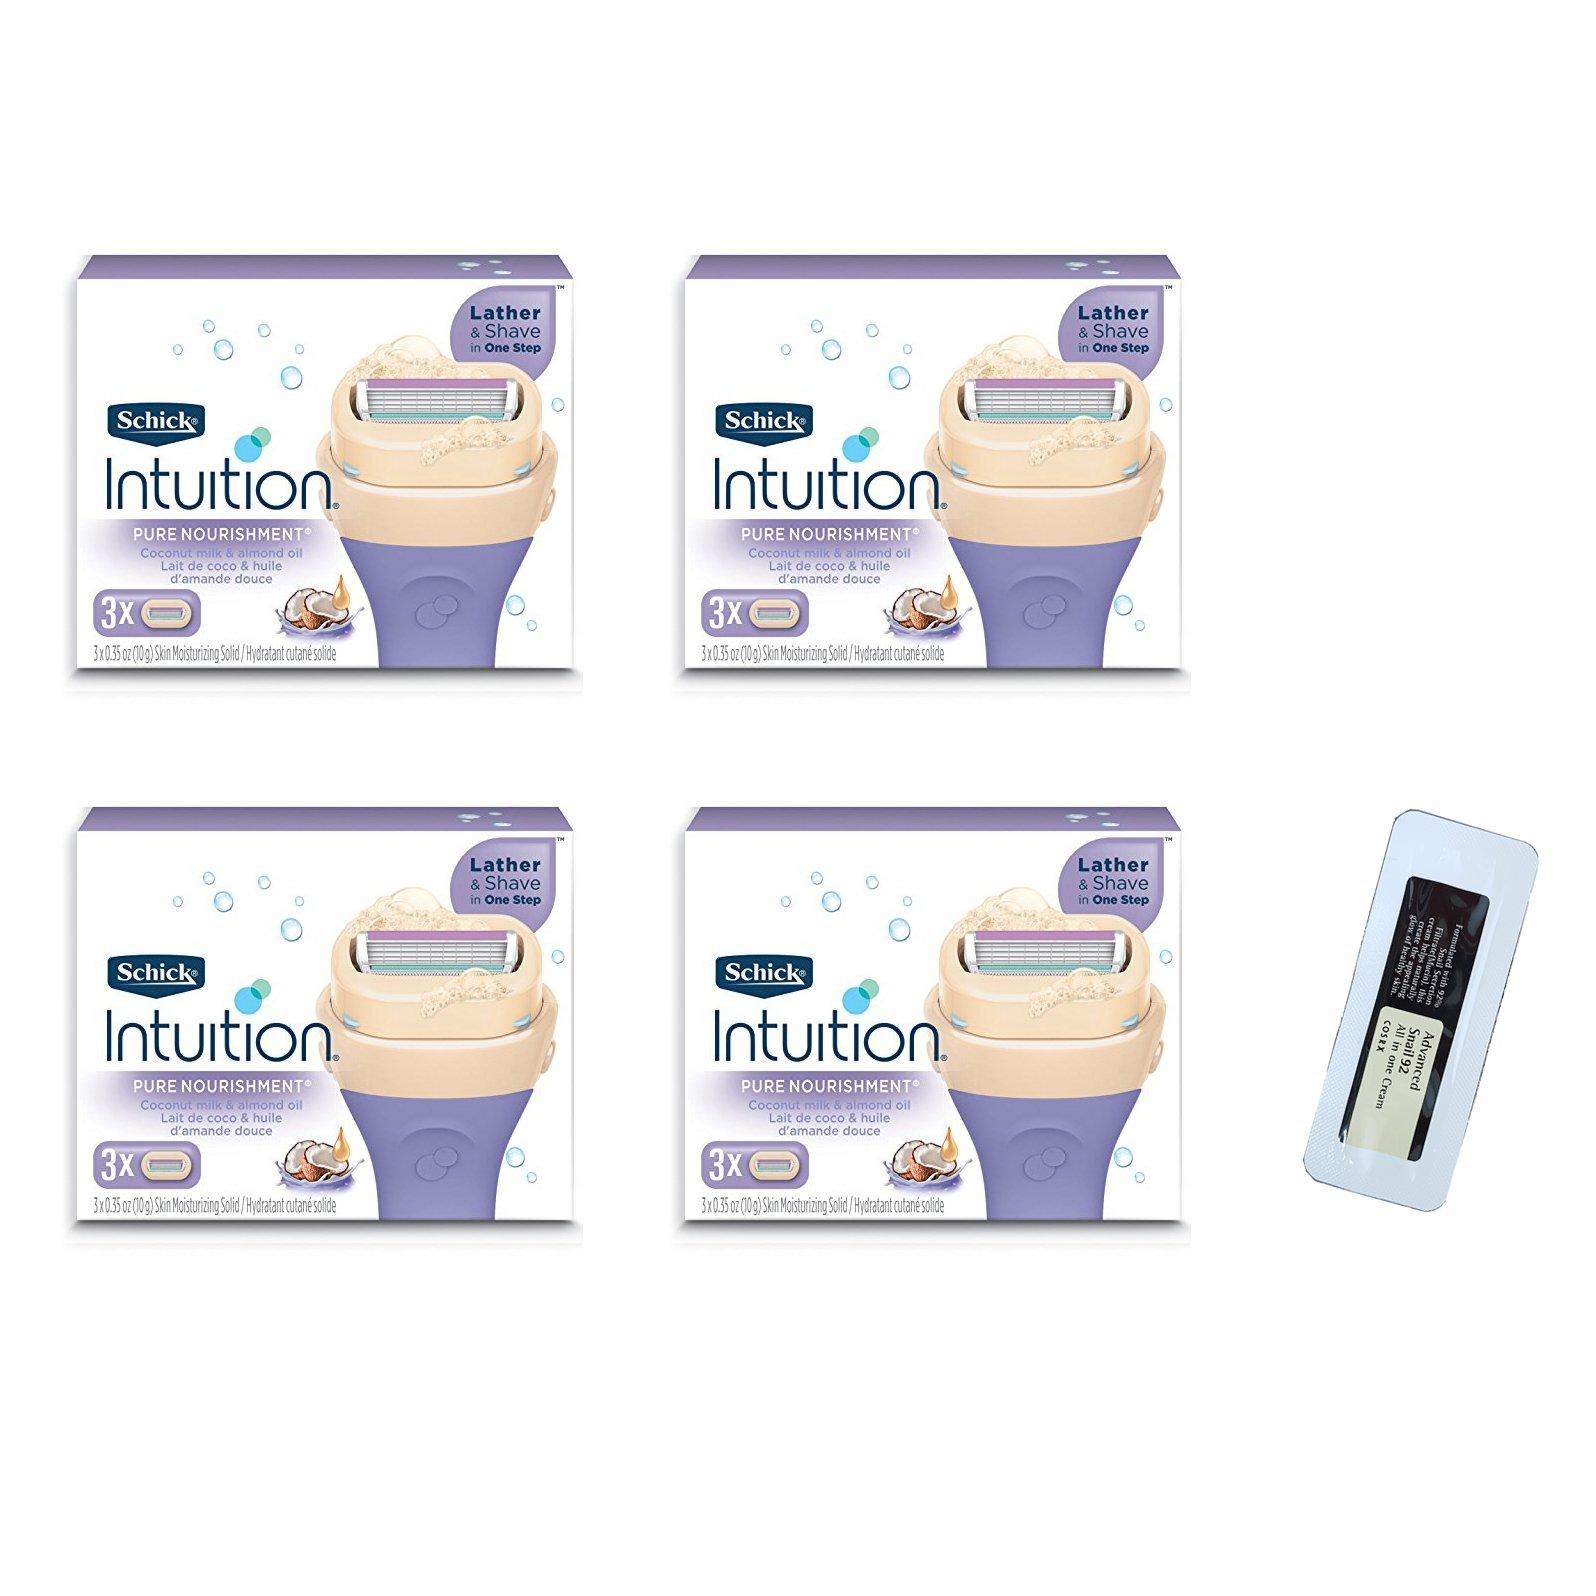 Shick Intuition Pure Nourishment Moisturizing Razor Blade Refills for Women with Coconut Milk & Almond Oil - 12 Count …